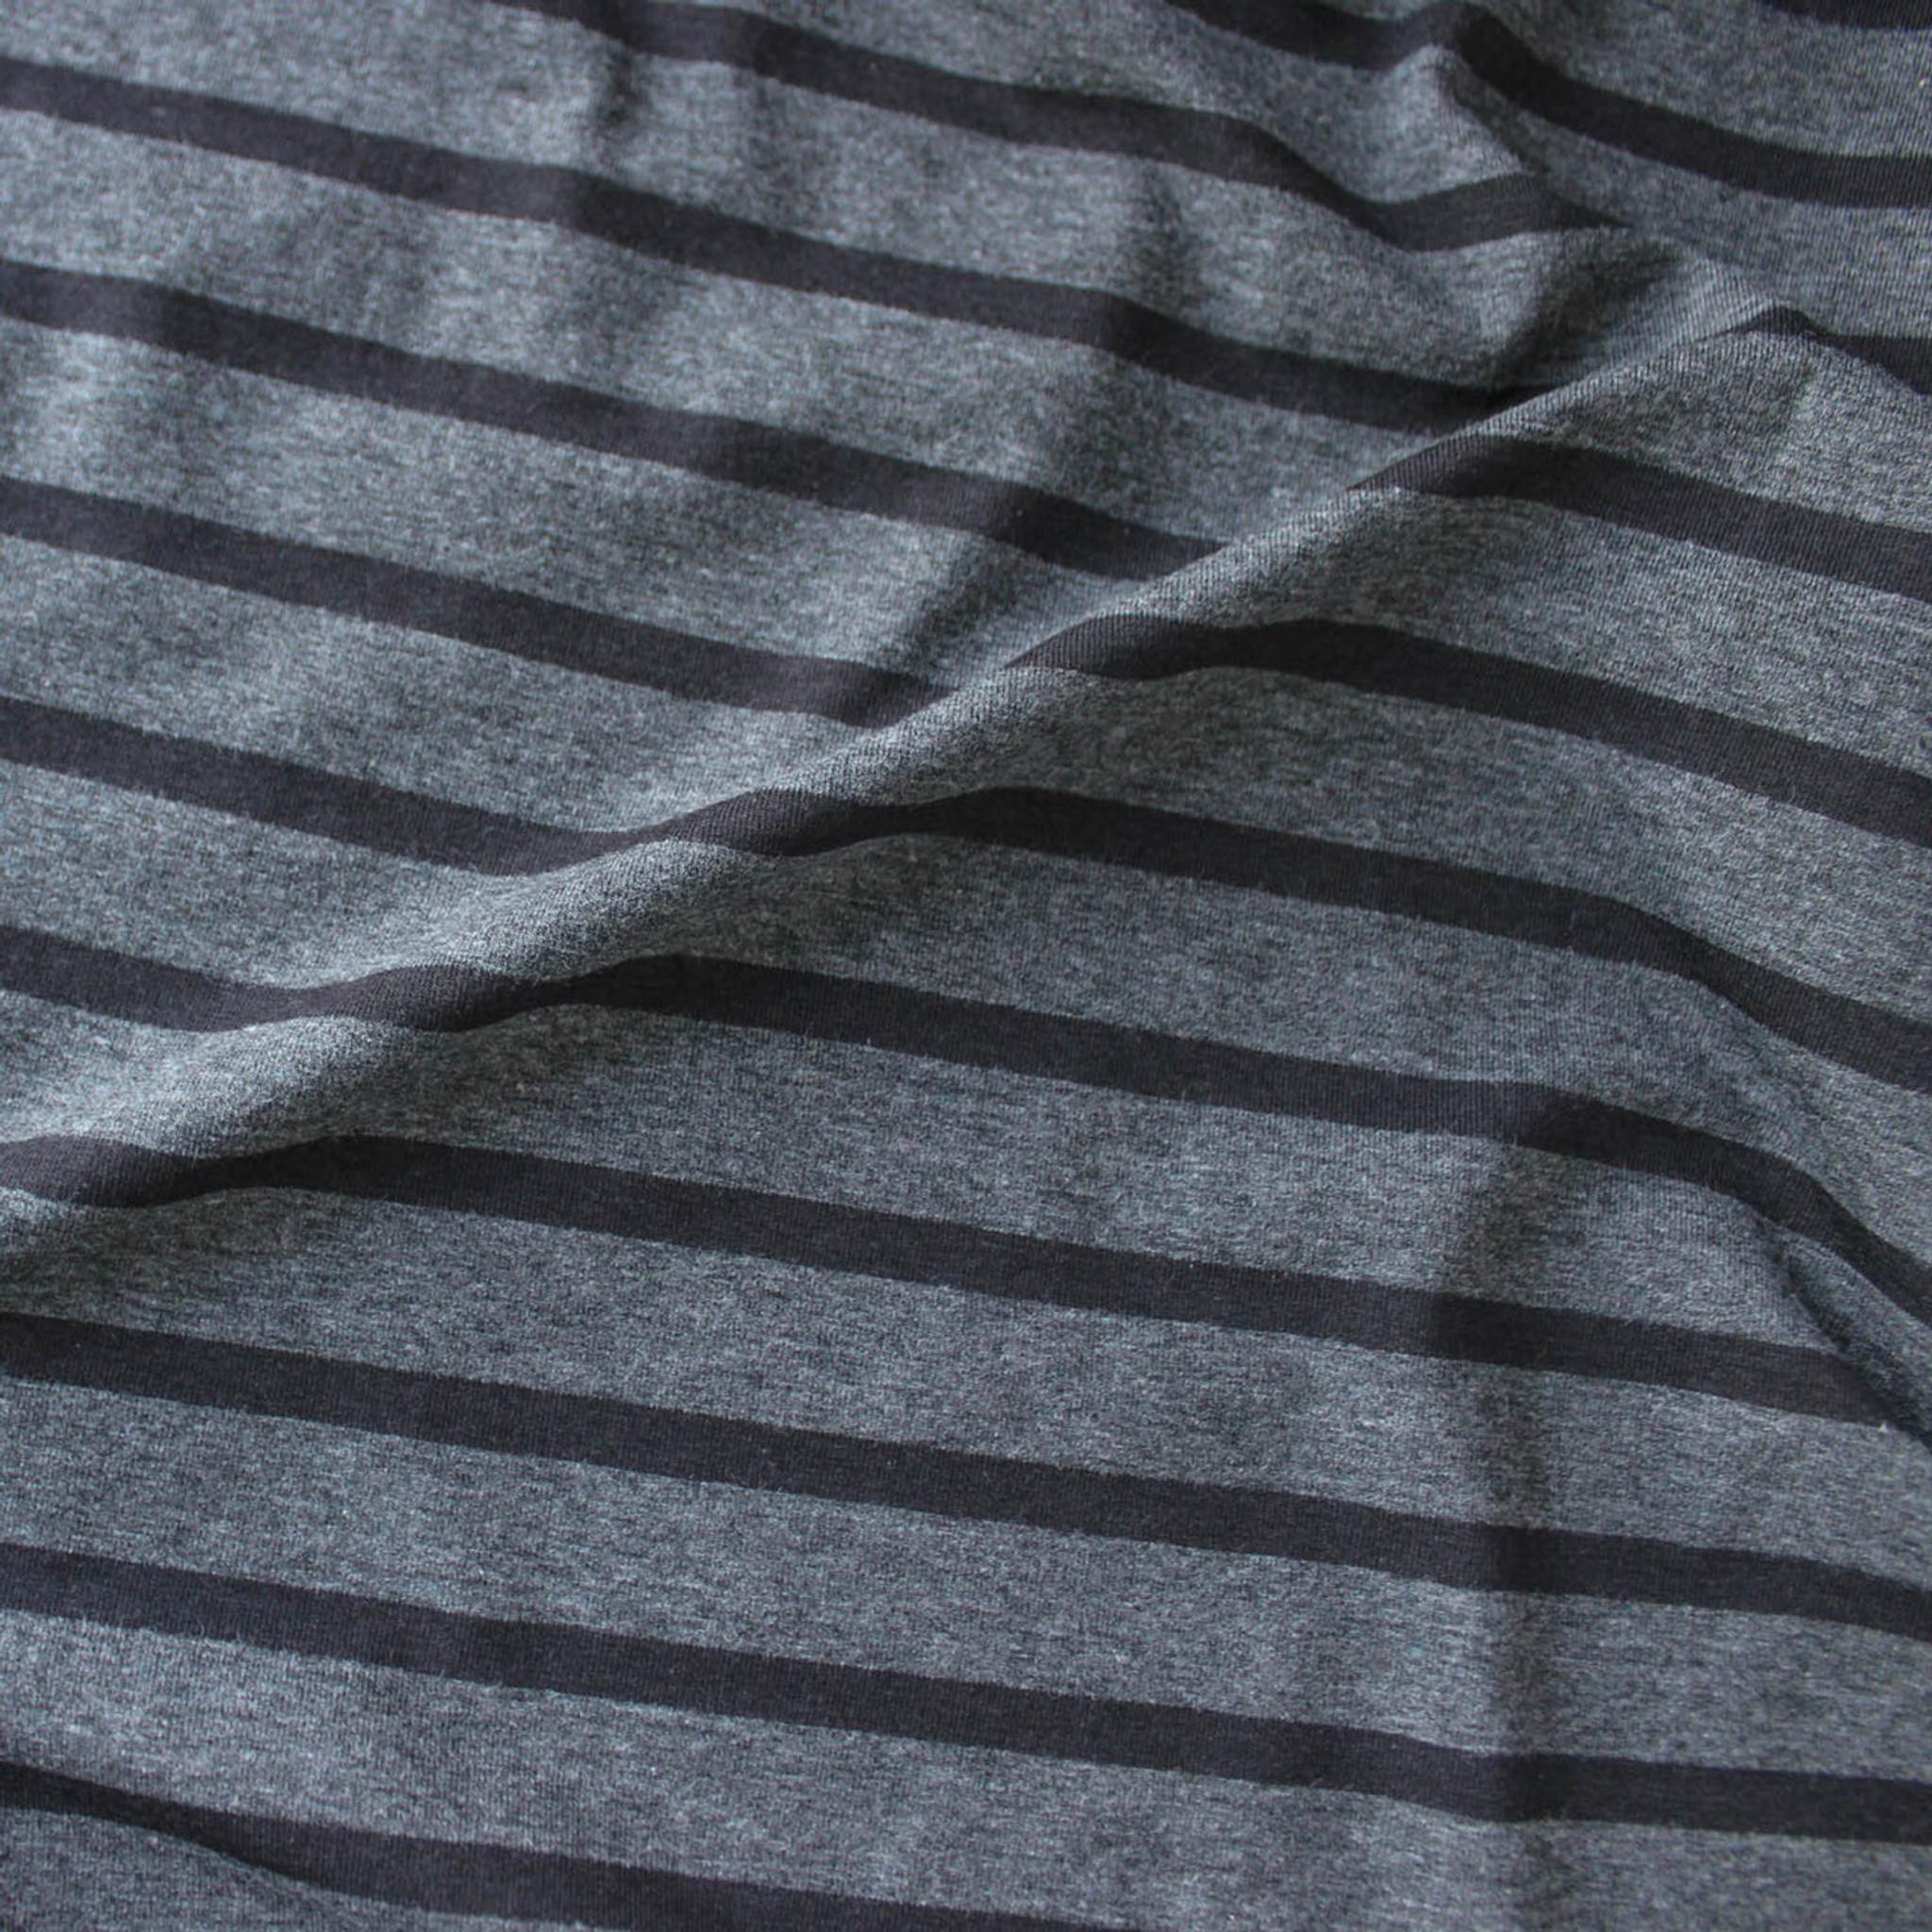 52f0c5c4ec6 Bamboo & Cotton Striped Jersey Knit - Heather Charcoal/Black | Blackbird  Fabrics